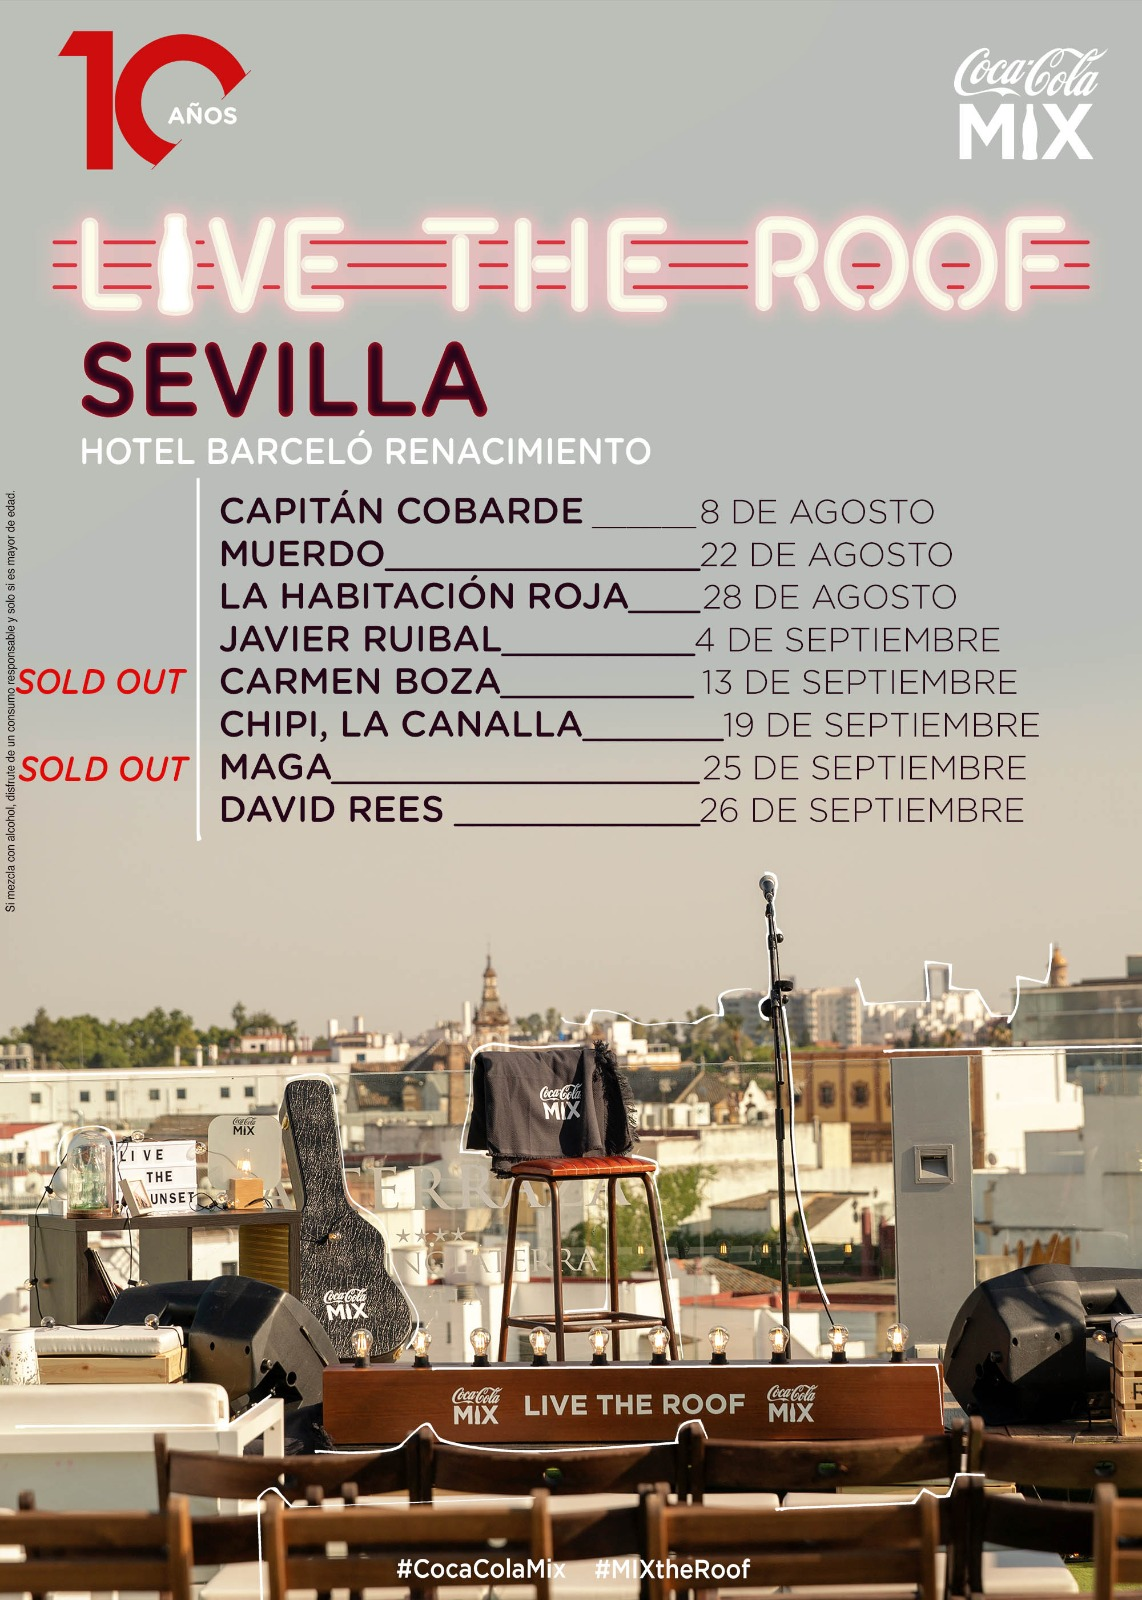 Sevilla celebra el décimo aniversario del ciclo Live The Roof